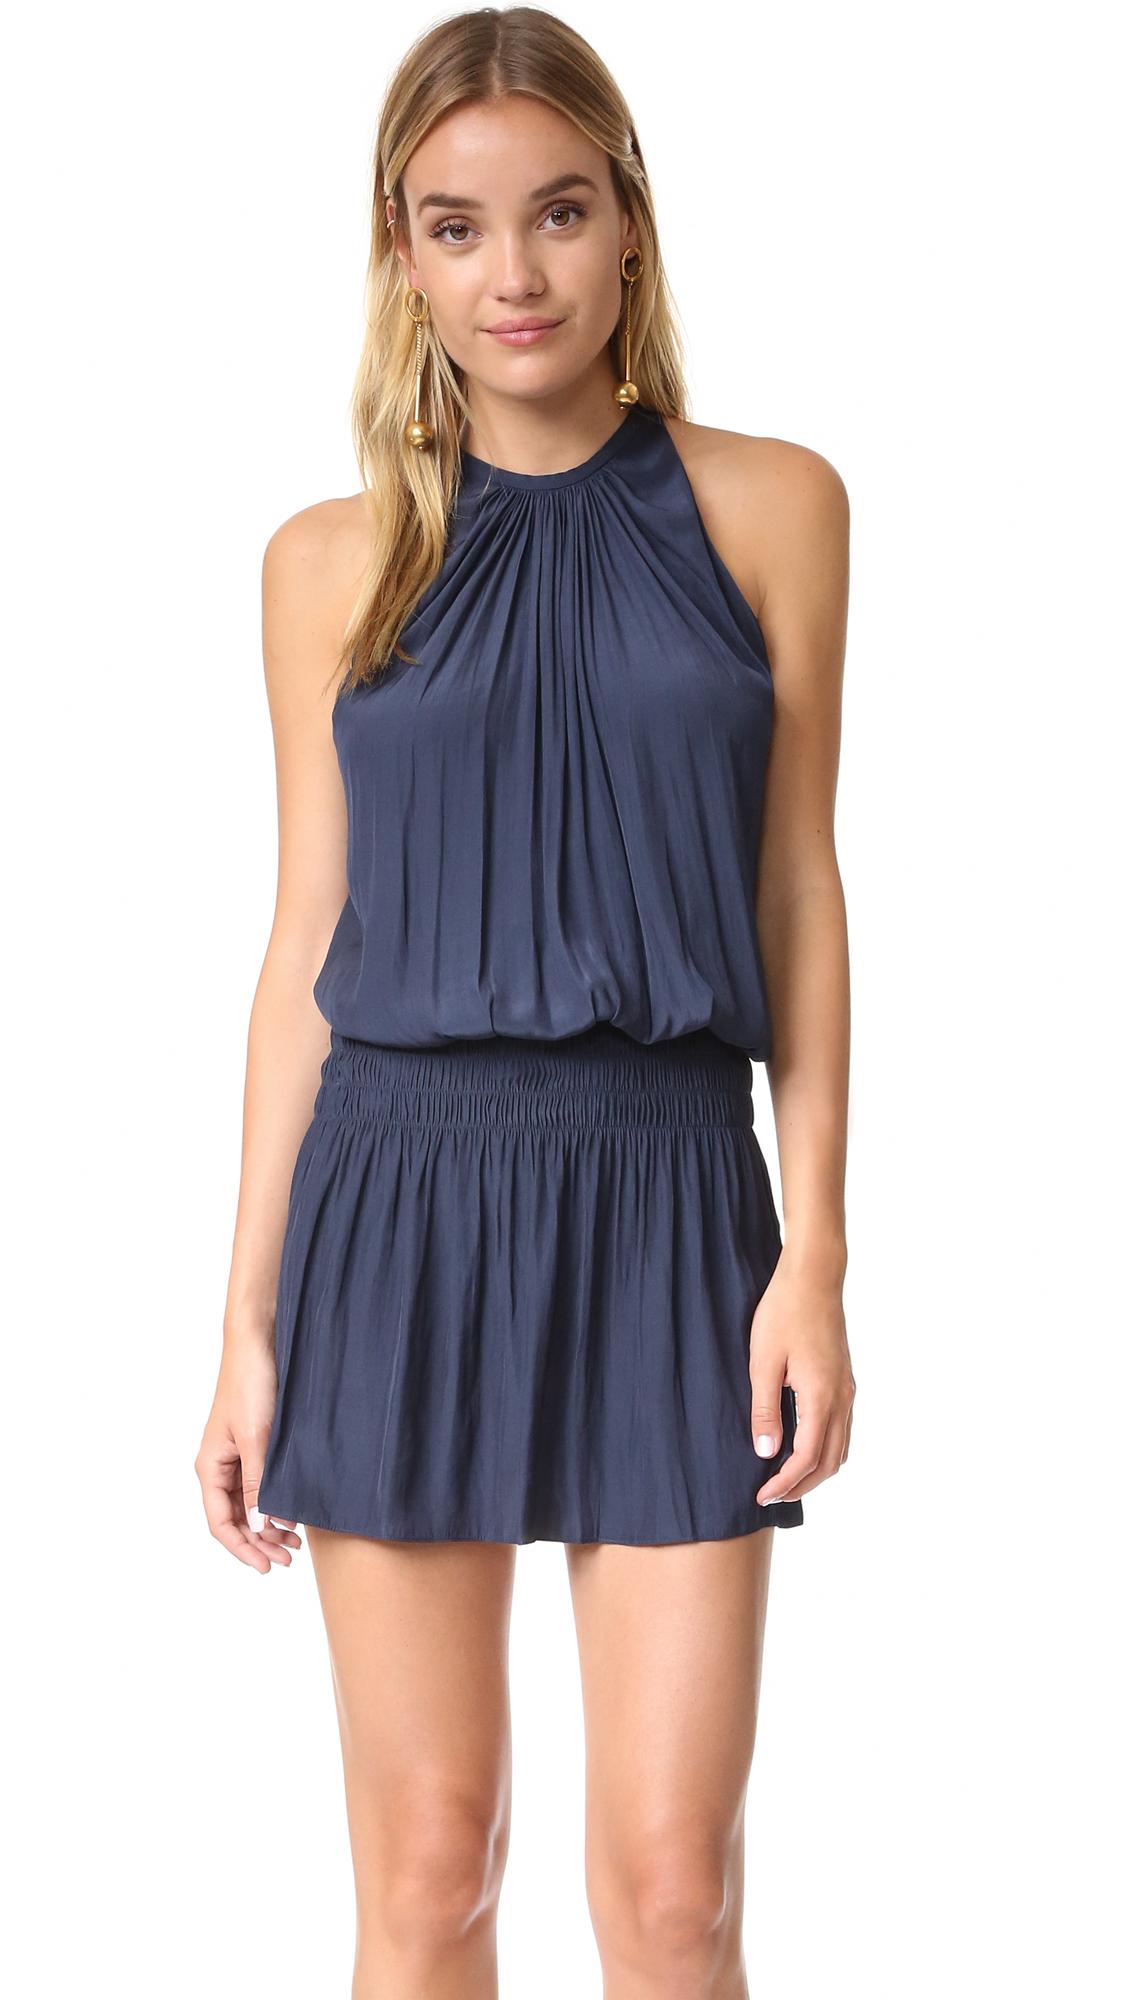 Ramy Brook Paris Sleeveless Dress - Navy